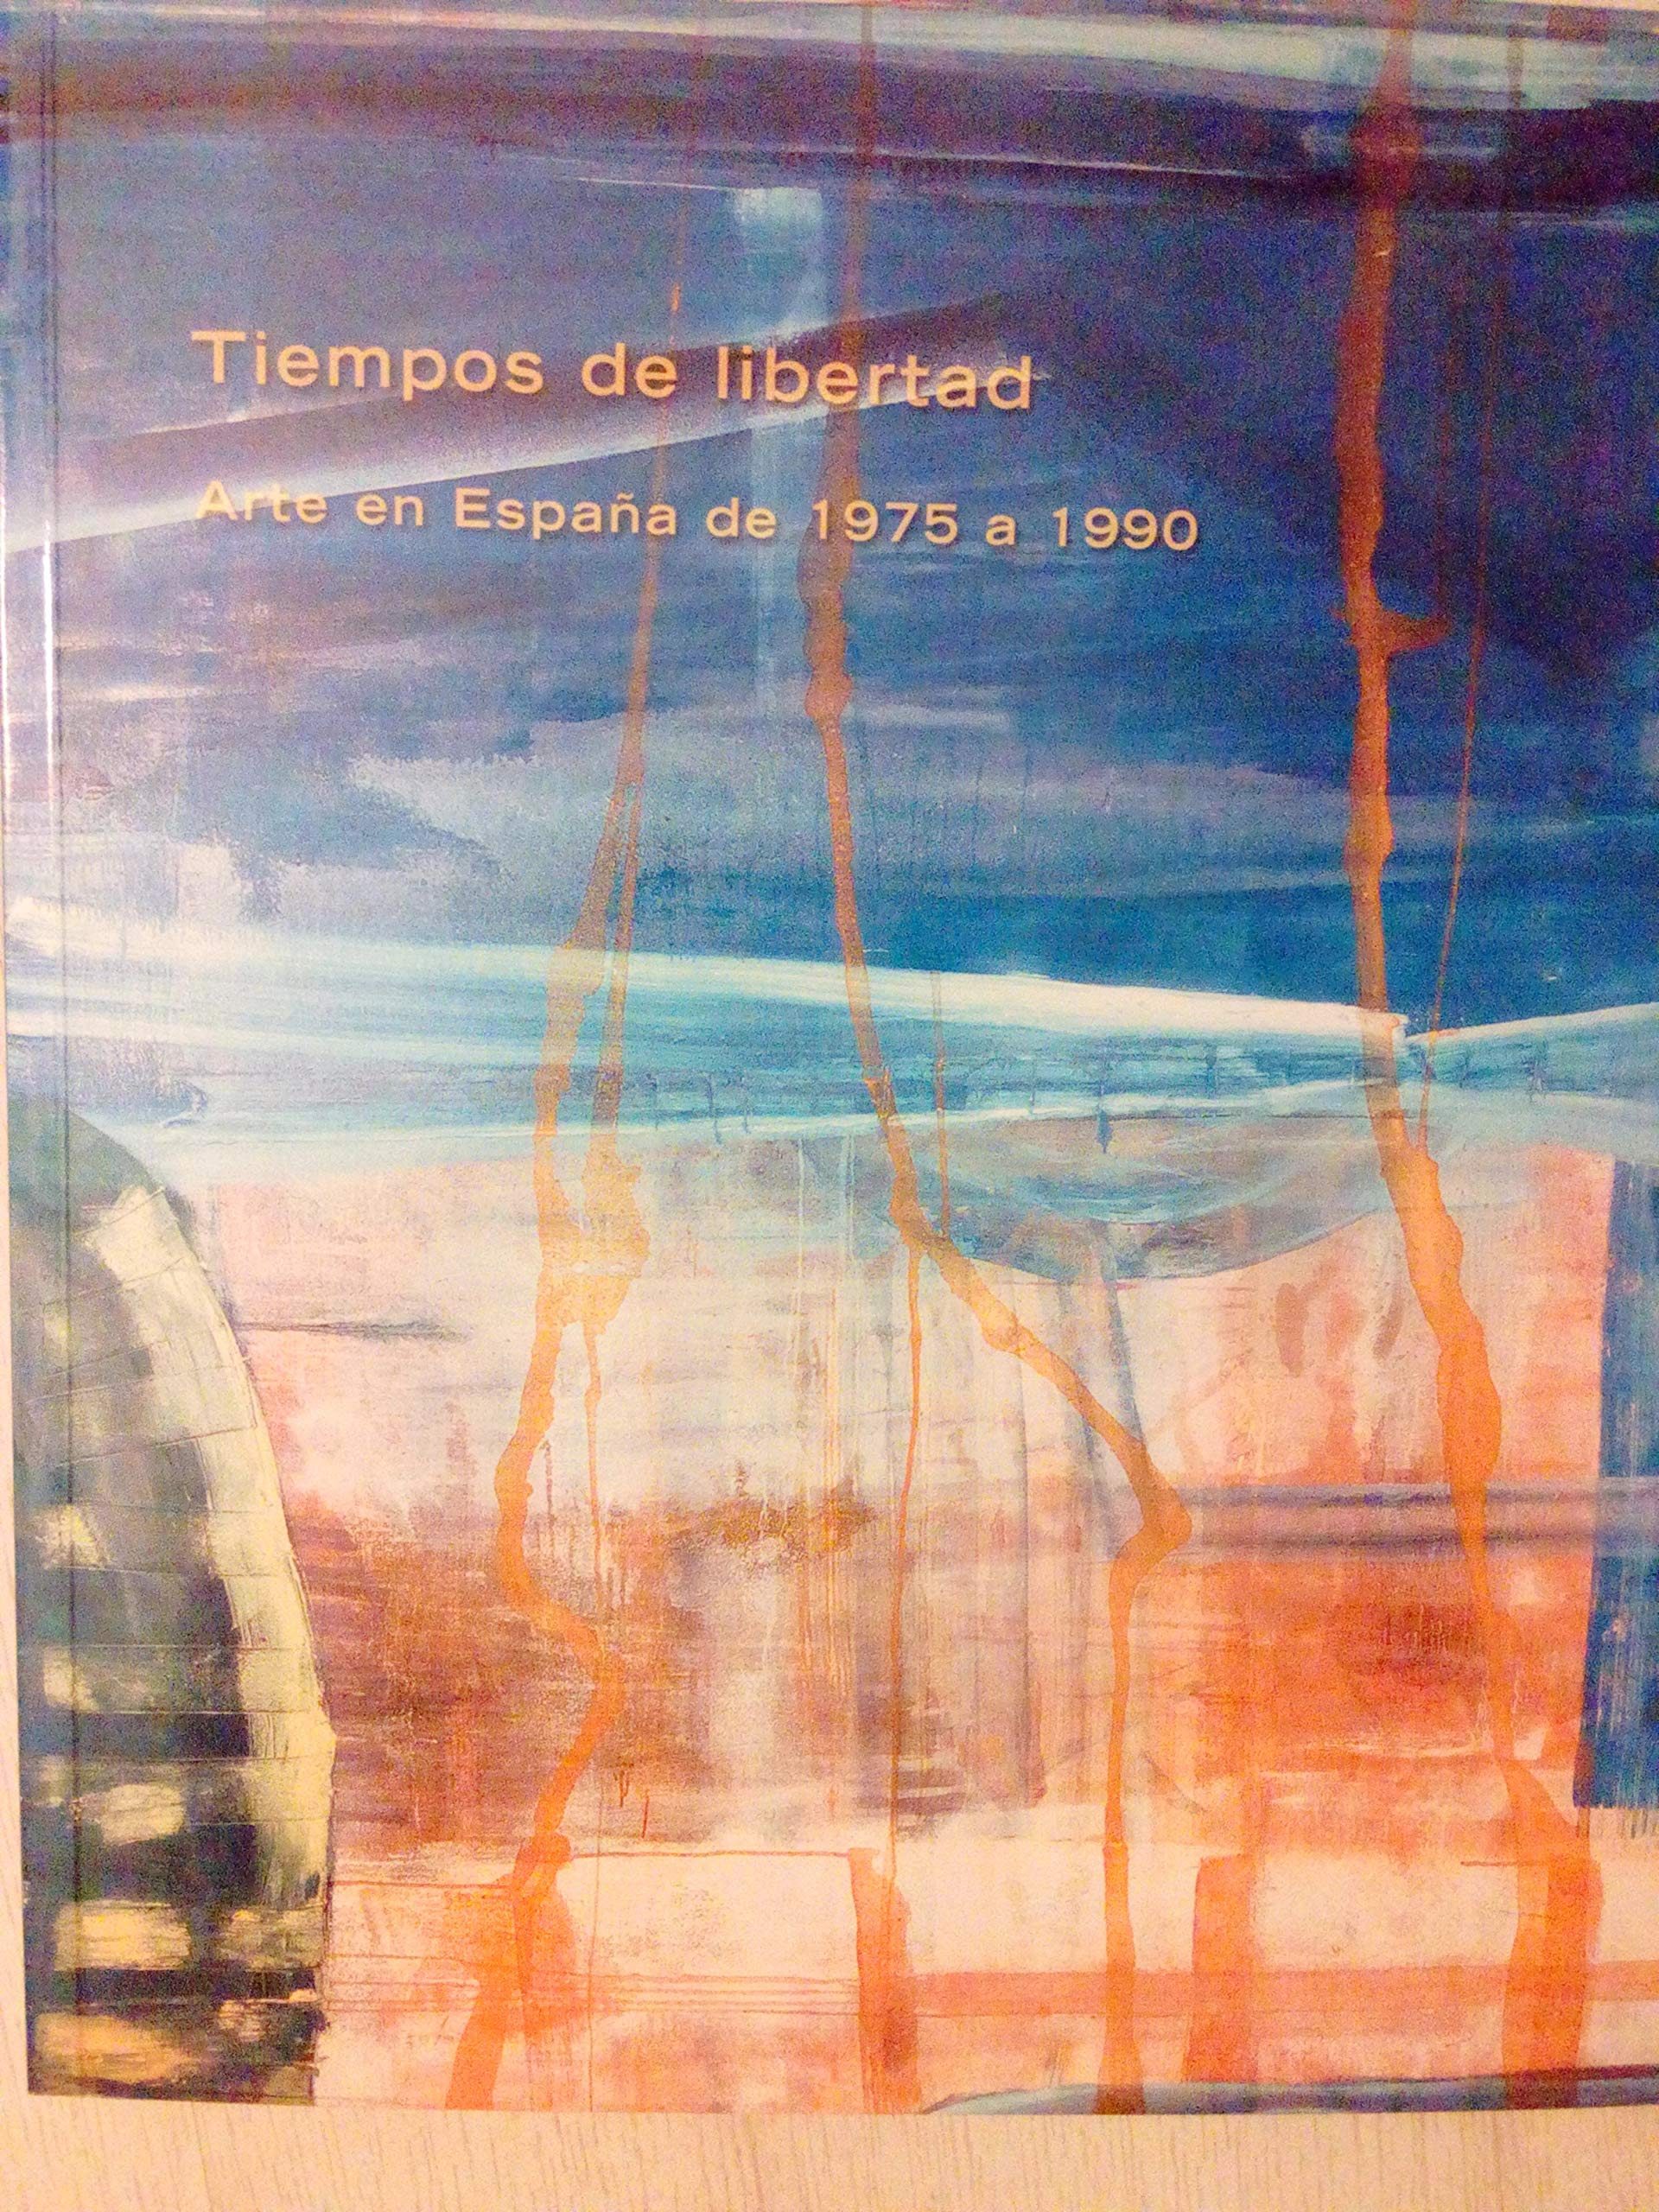 Tiempos de libertad: arte en España de 1975 a 1990 a cargo de oscar Alonso Molina: Amazon.es: Sin Autor: Libros